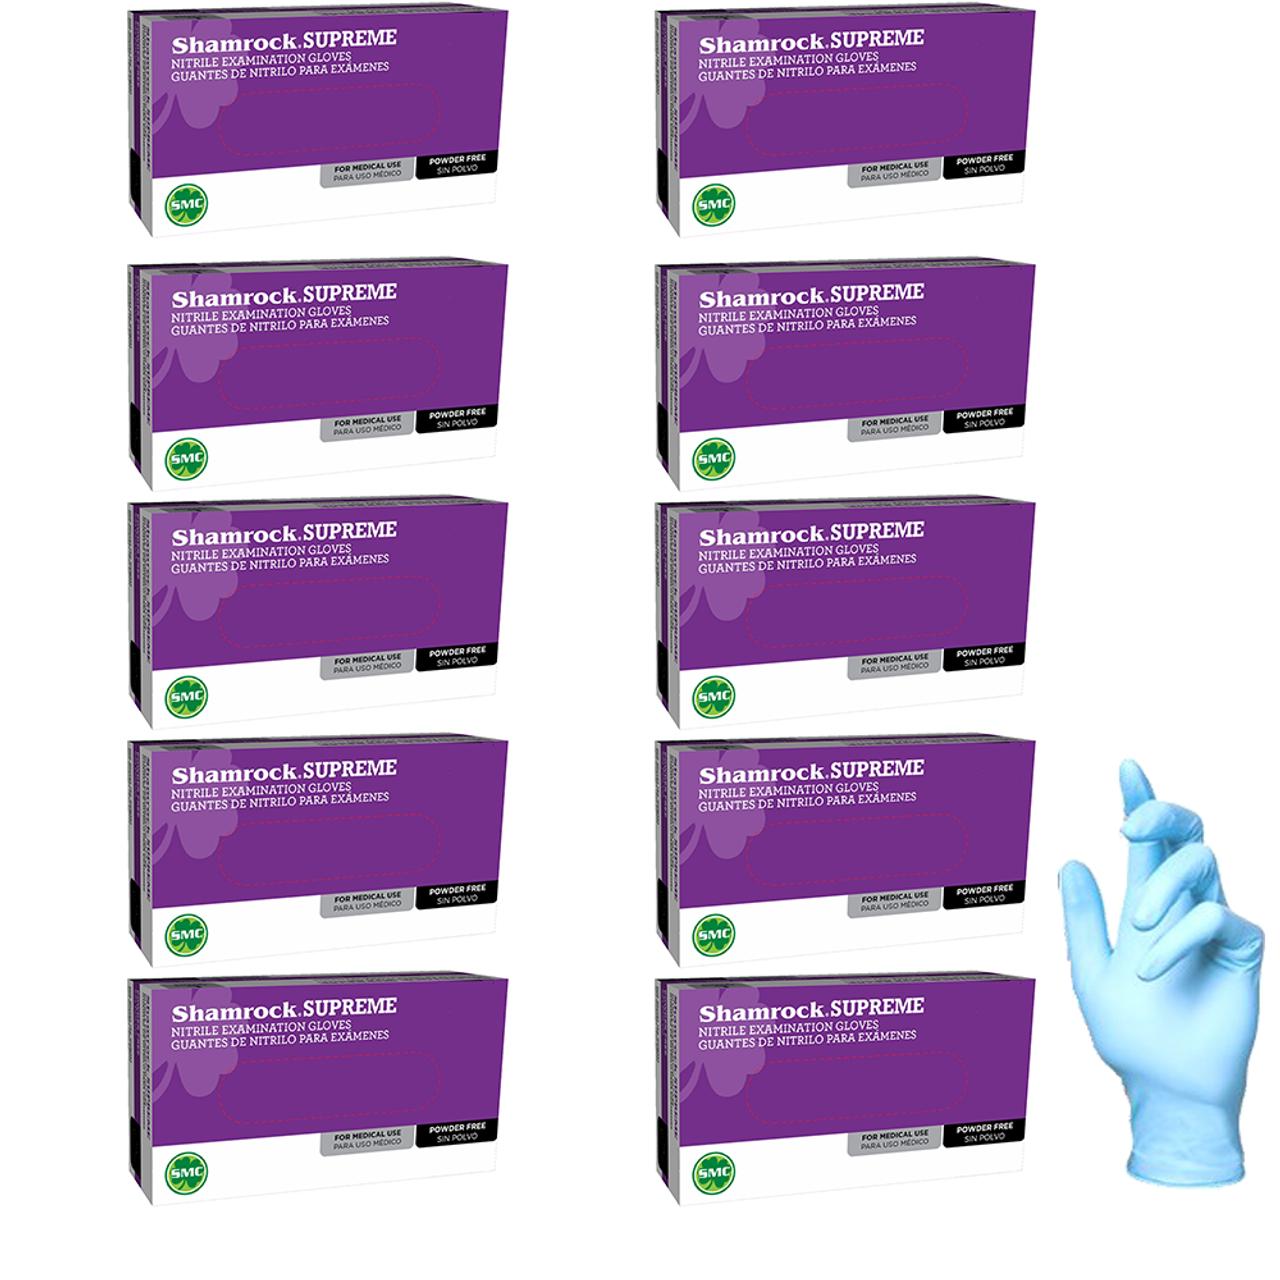 Shamrock Supreme Blue Nitrile Exam Gloves, Powder Free, Textured, Size Medium, Case pack of 950 gloves